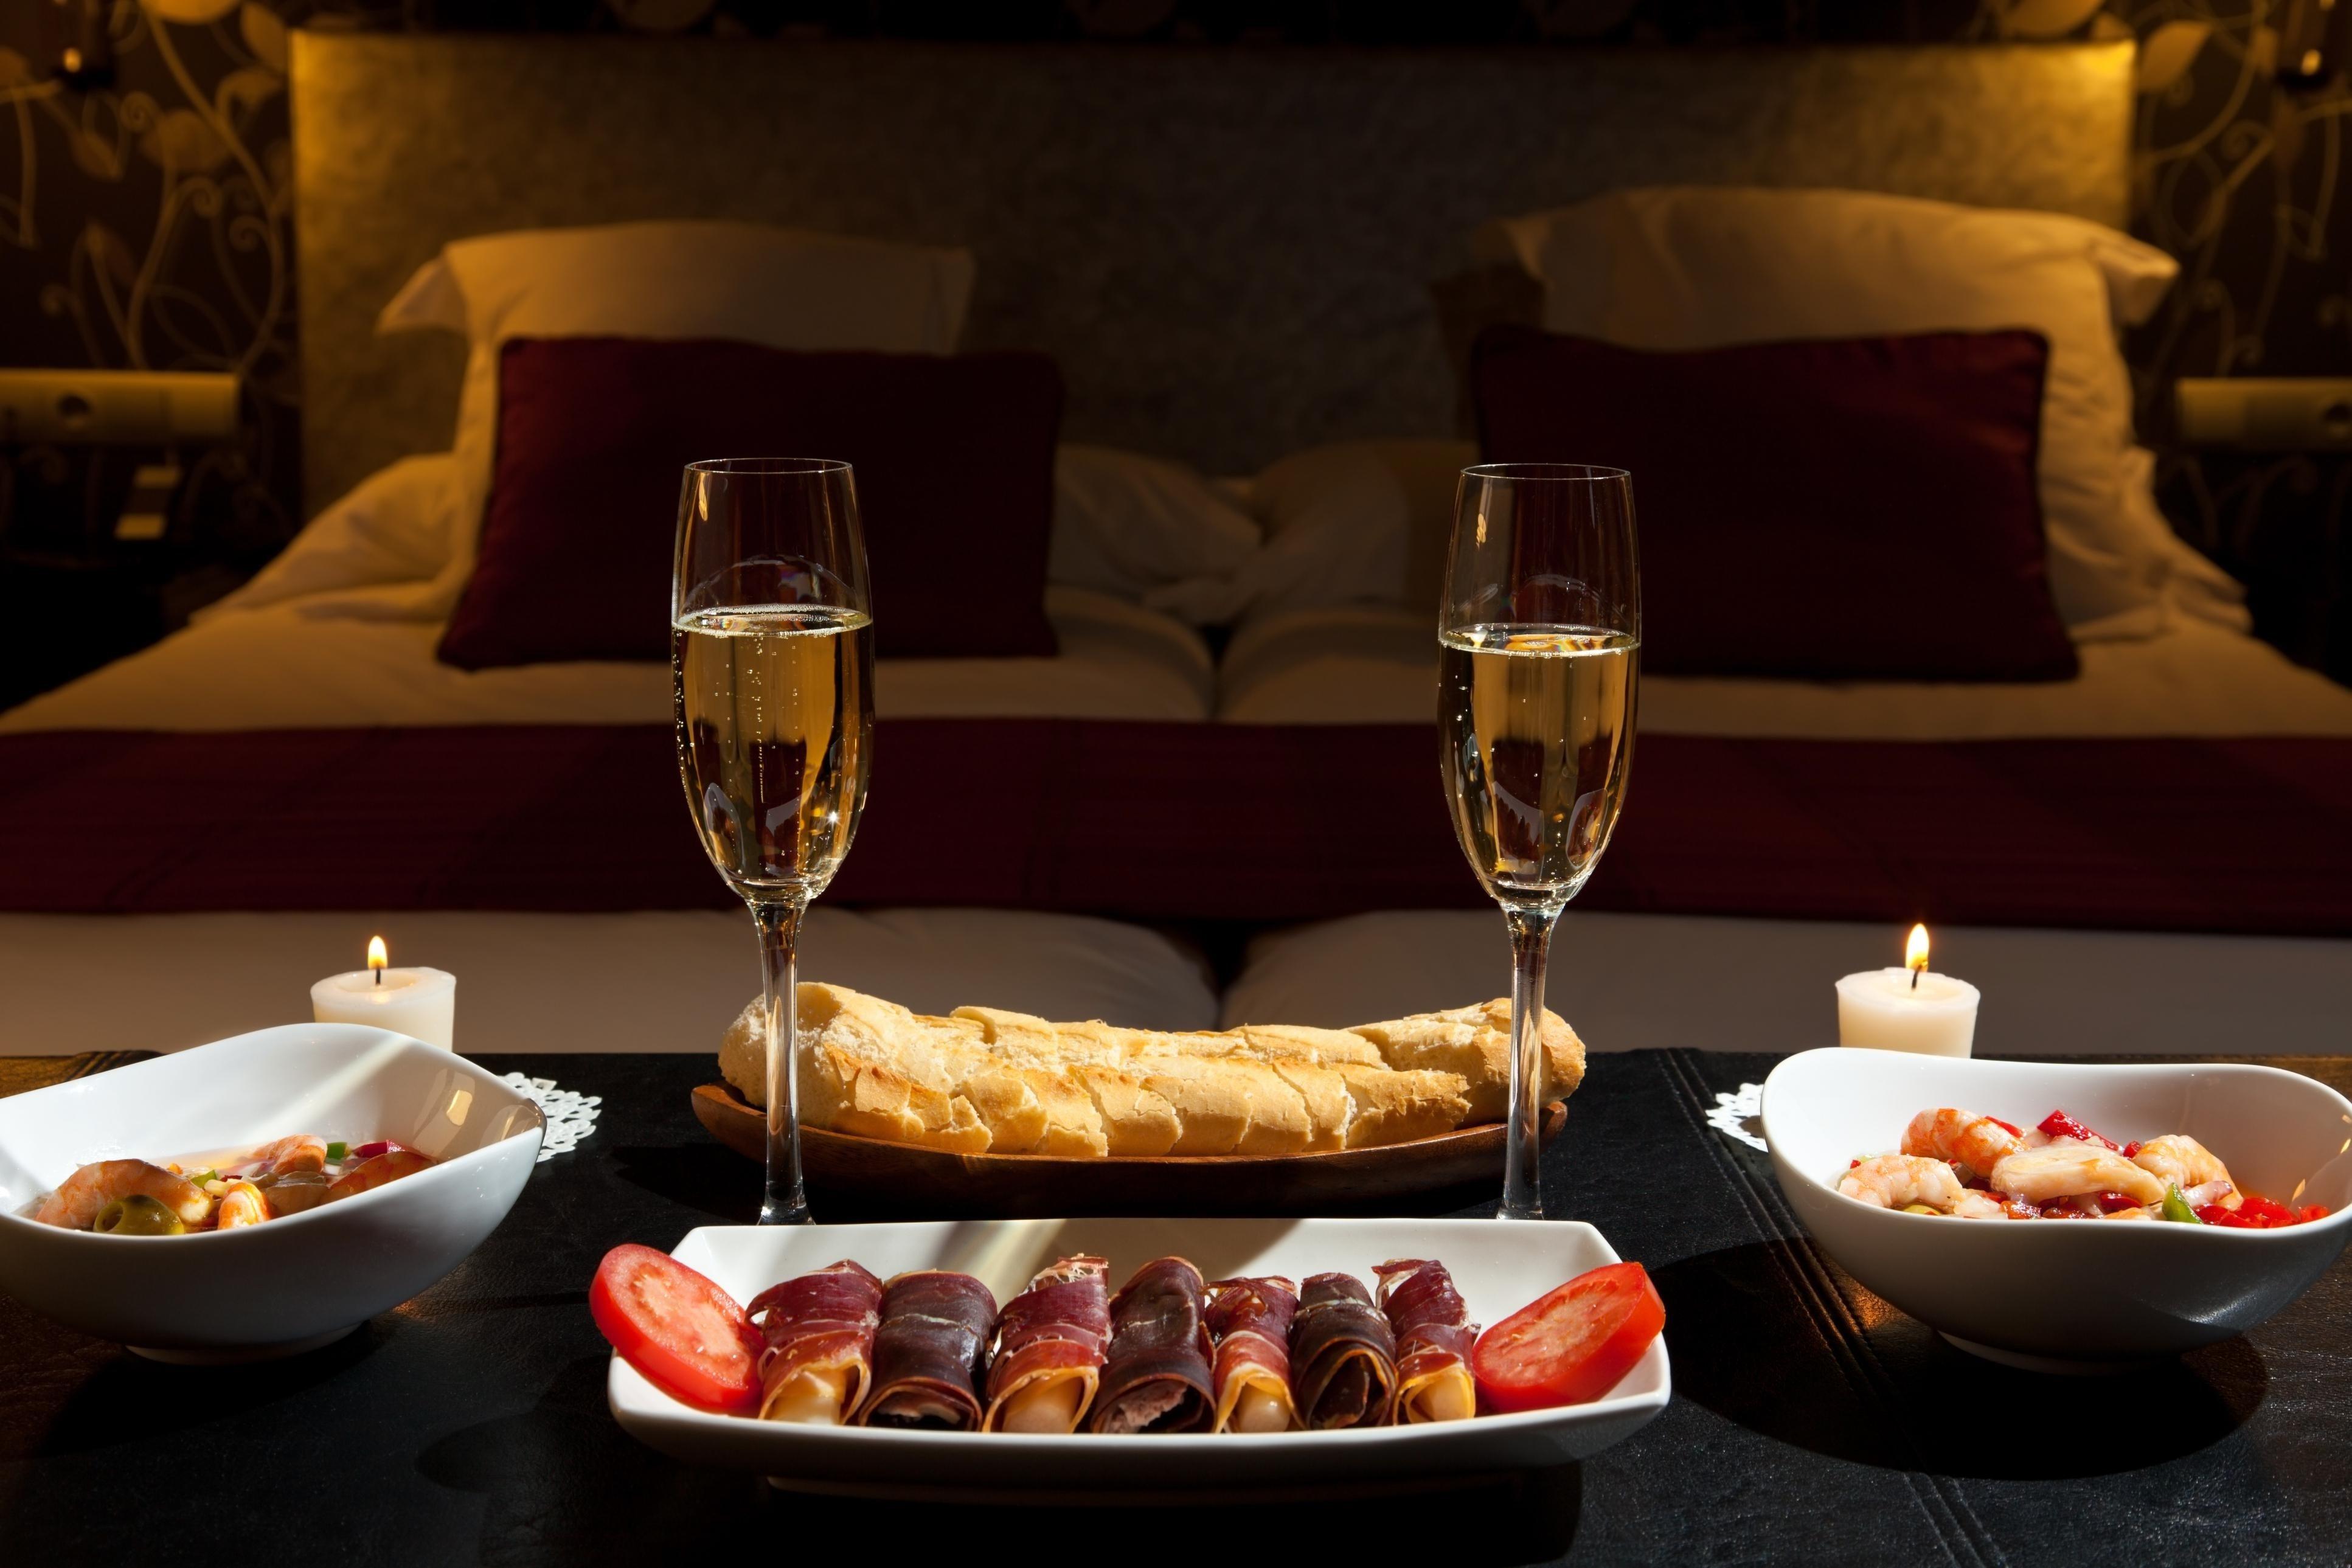 10 Attractive Romantic Dinner Ideas For Two facebook twitter google pinterest linkedin stumbleupon e mail 5 2020